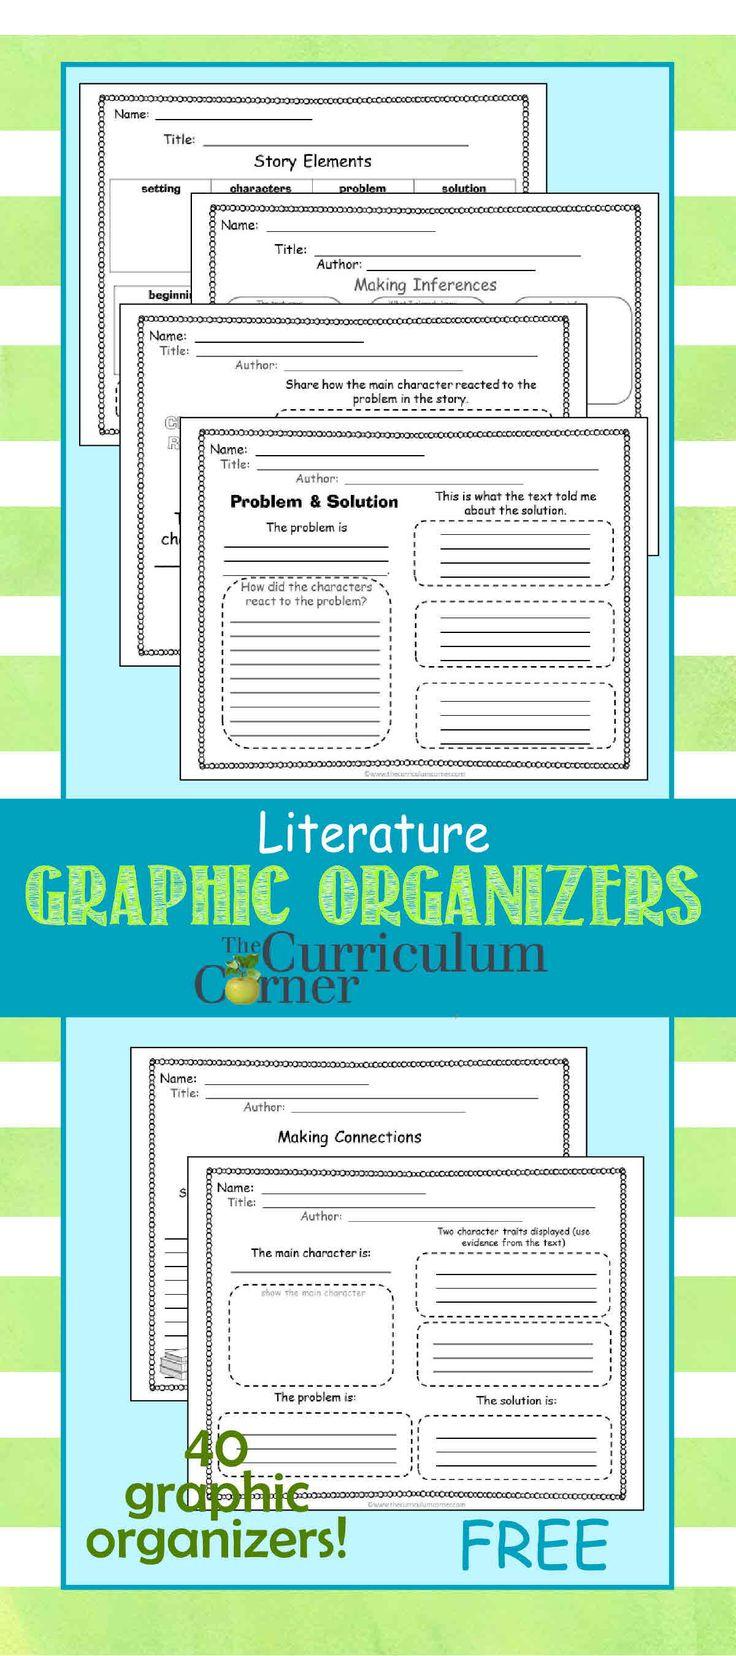 Workbooks making inferences worksheets grade 3 : 576 best ELA - Reading images on Pinterest | Writing, Books and ...